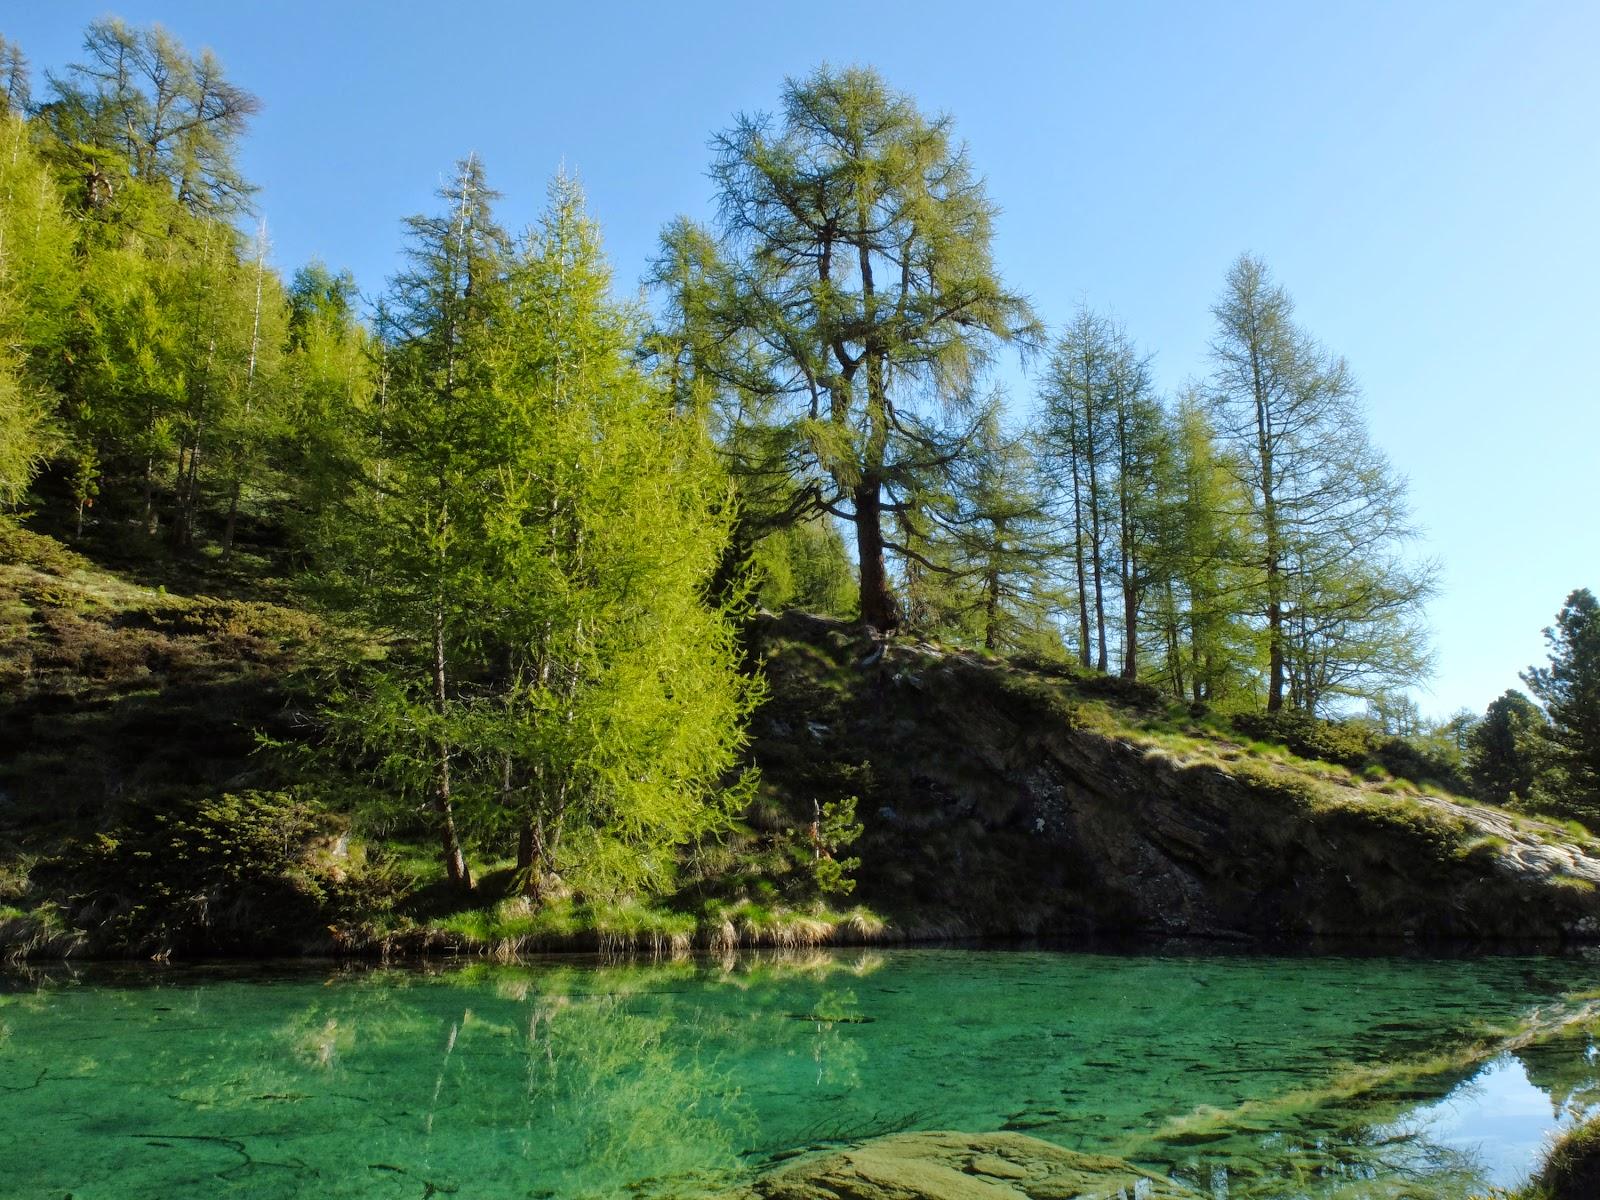 Randonnée trekking valais - Val d'hérens